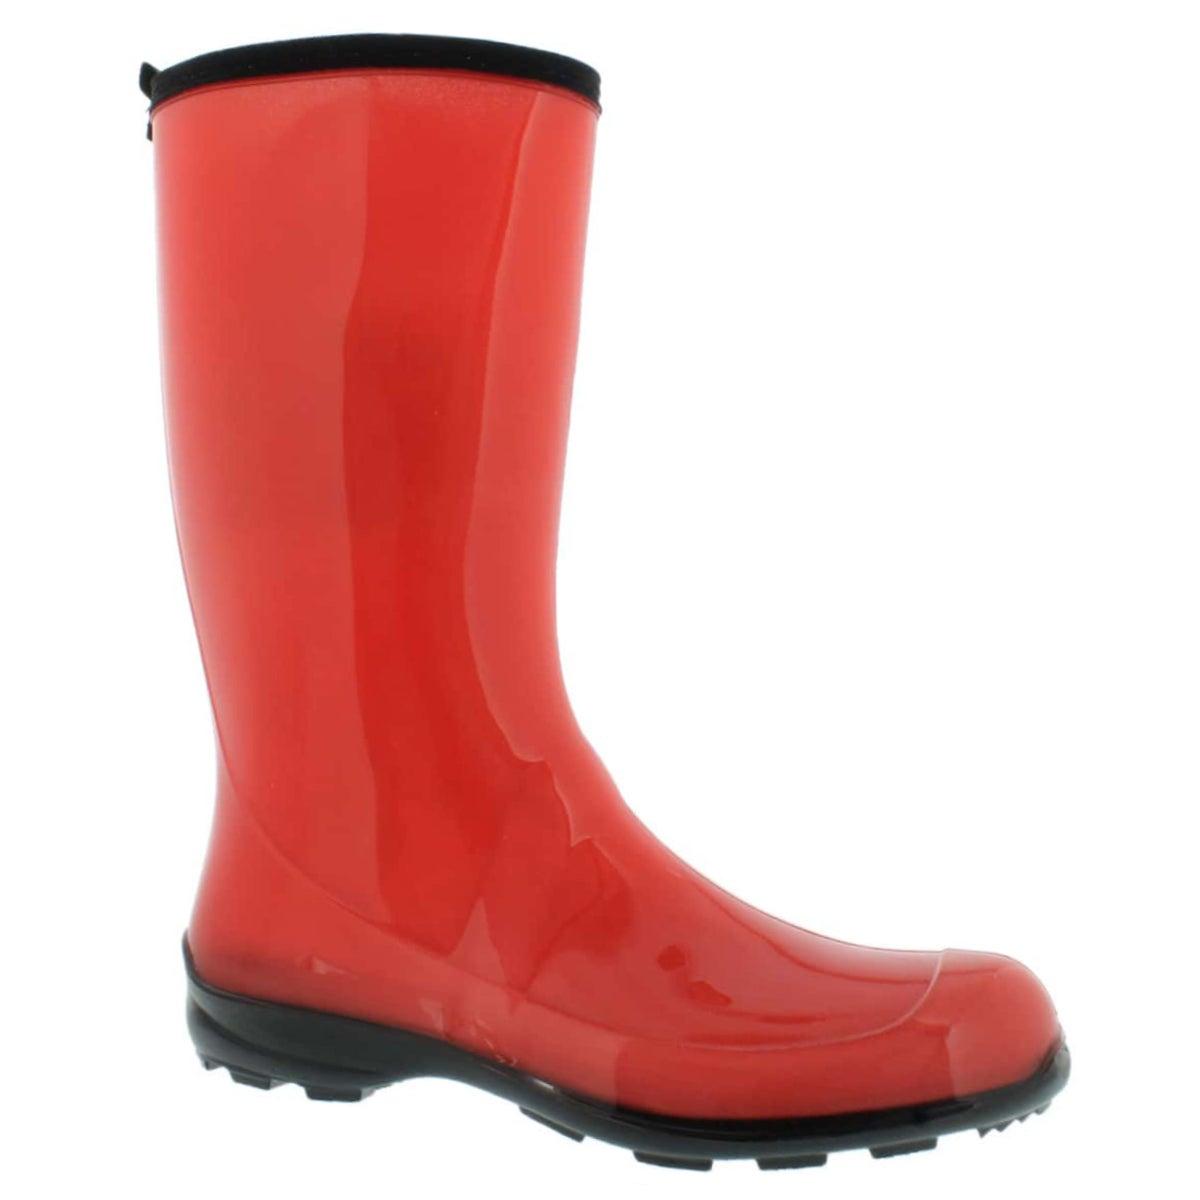 Lds Heidi coral mid wtpf rainboot